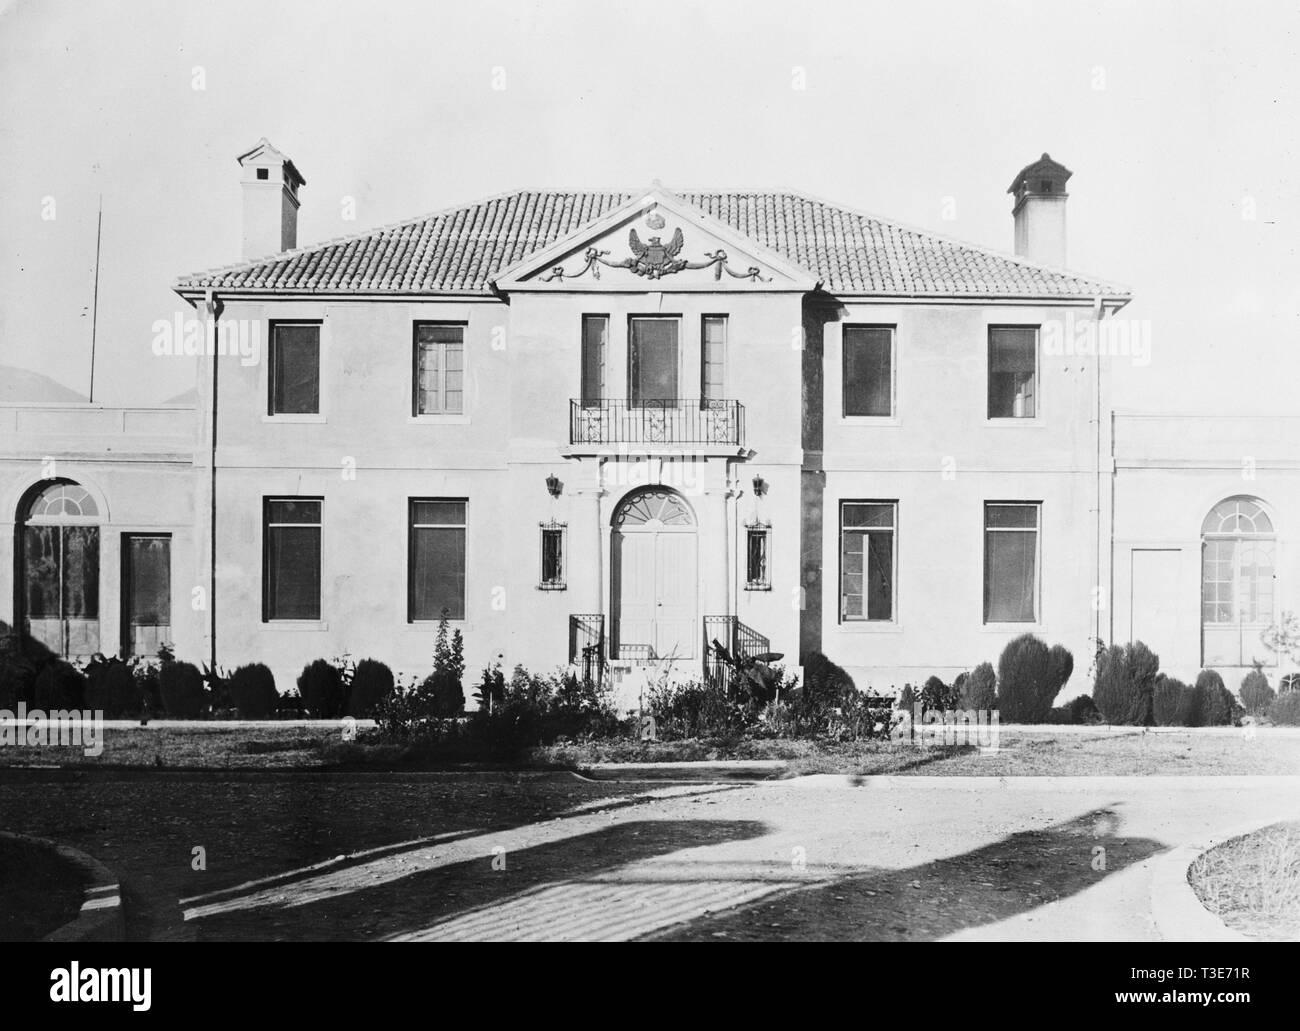 View of U.S. Legation in Tirana Albania ca. 1938 - Stock Image